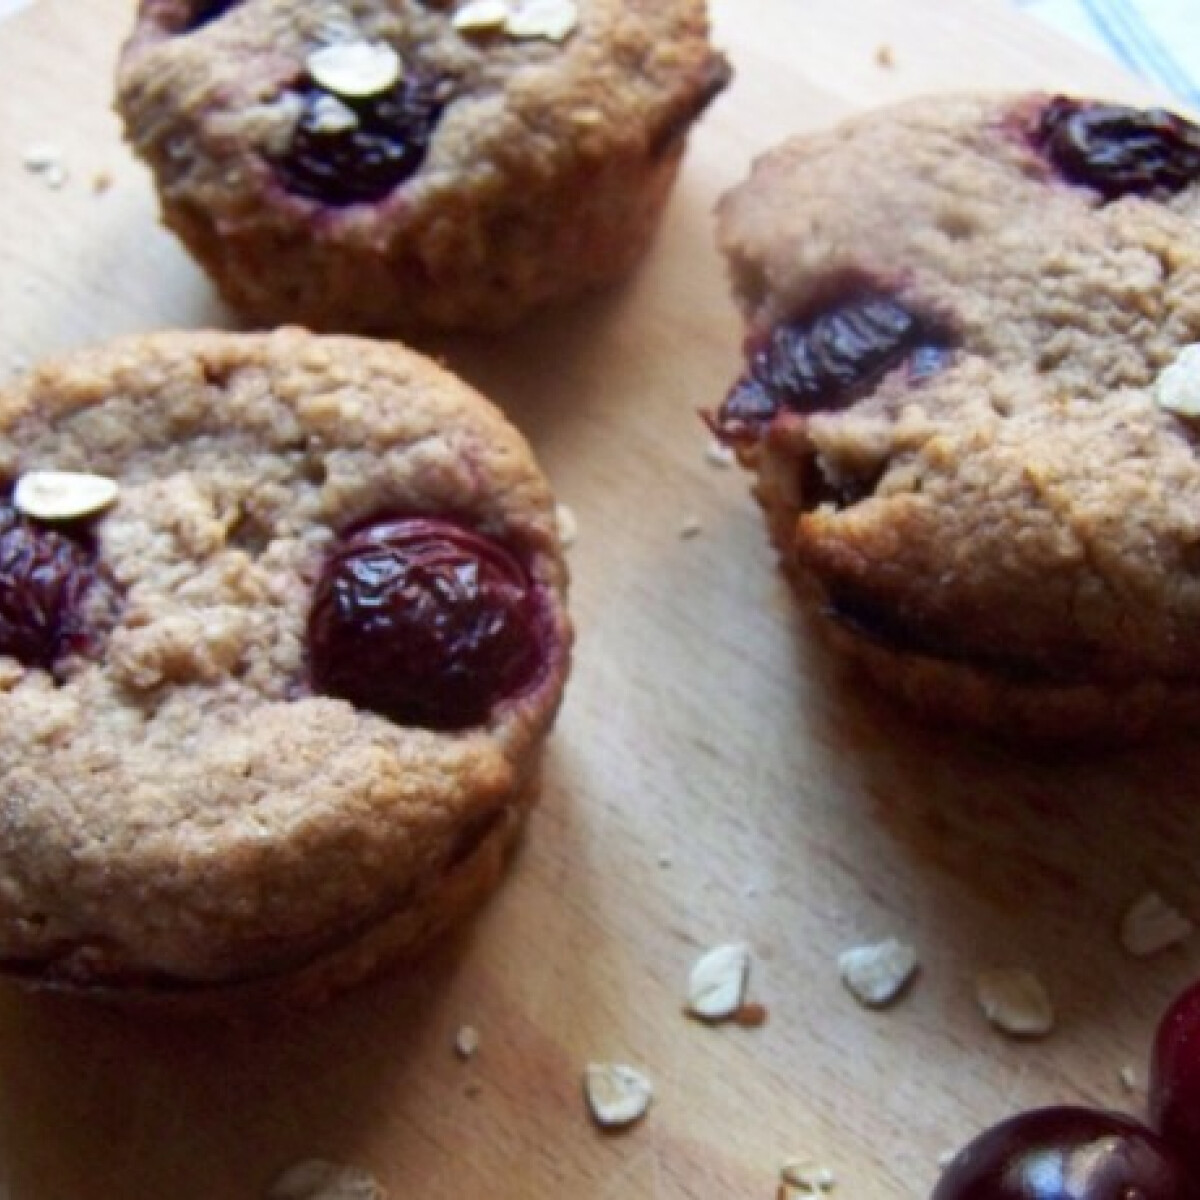 Meggyes muffin pipőke konyhájából